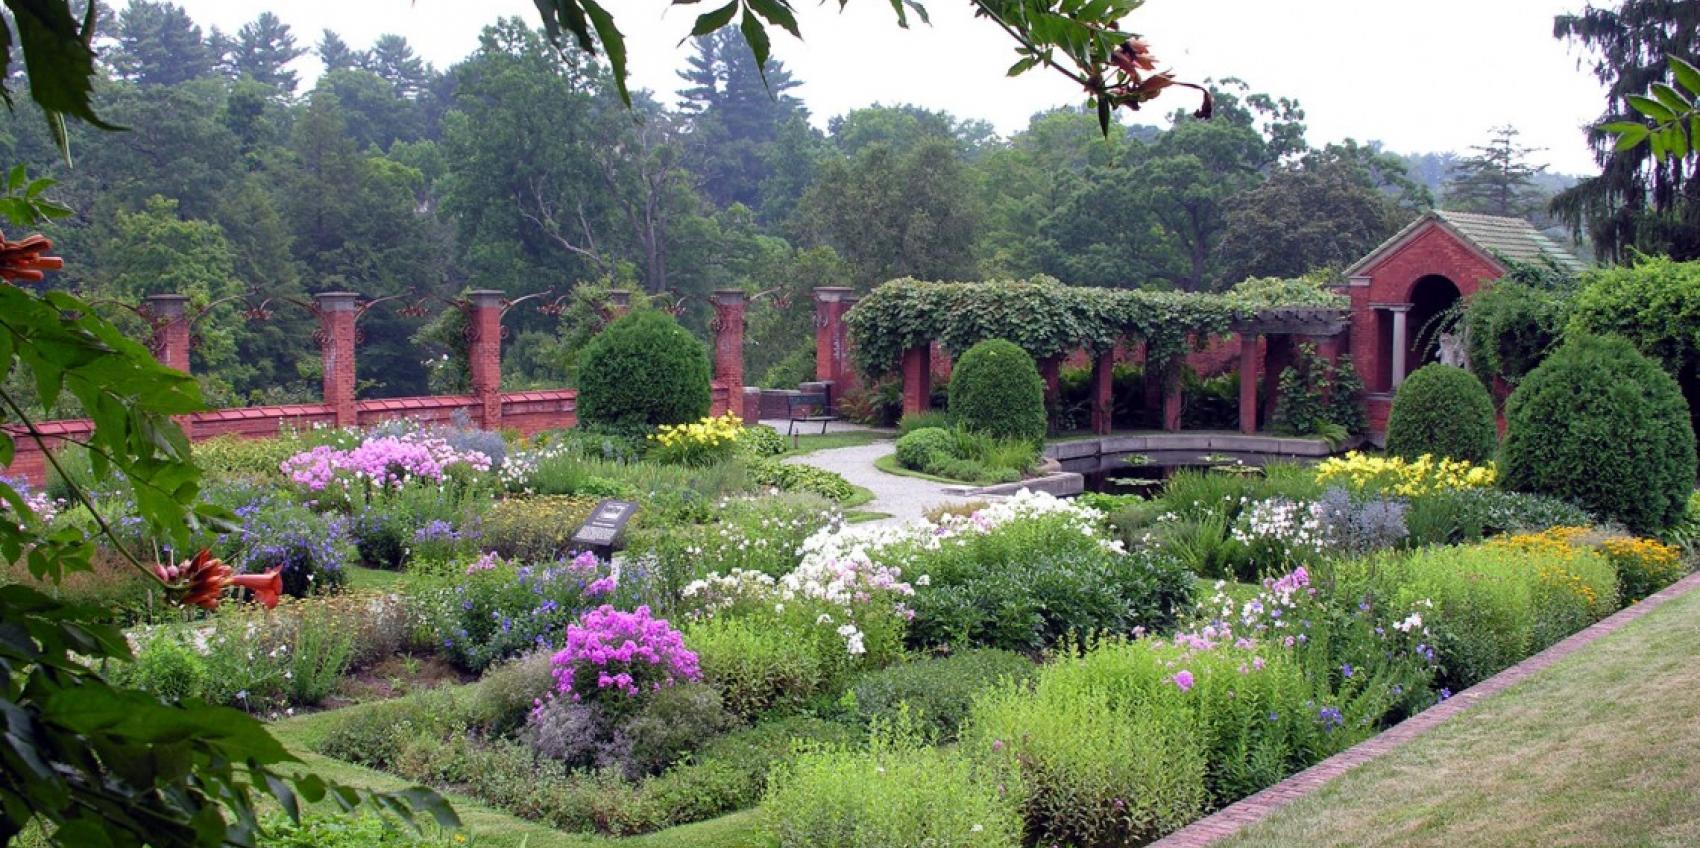 Roosevelt vanderbilt national historic site american for American garden association